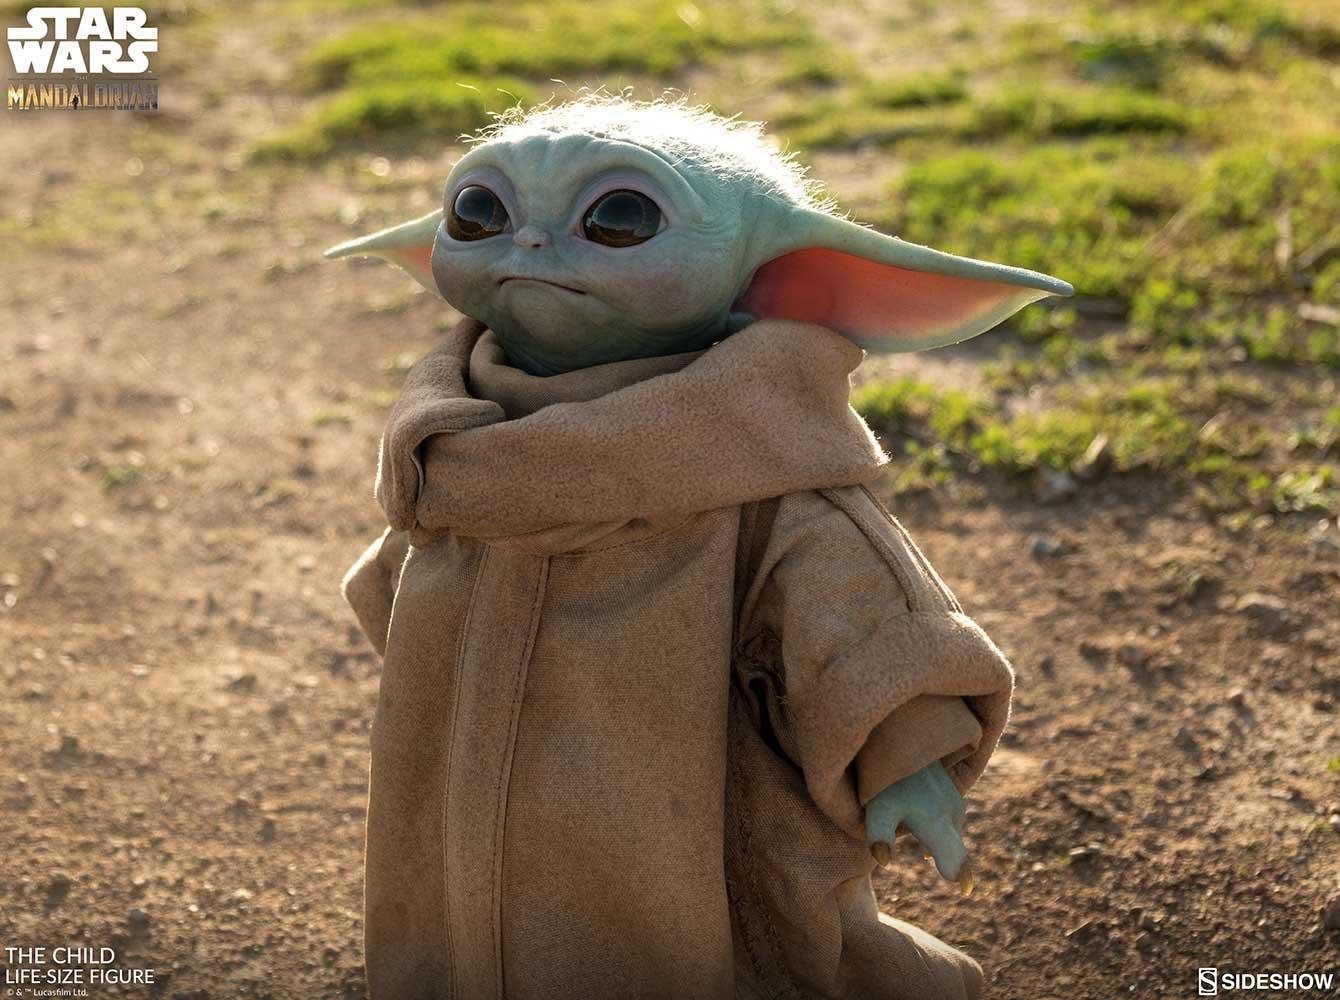 Star Wars: The Mandalorian baby Yoda The Child